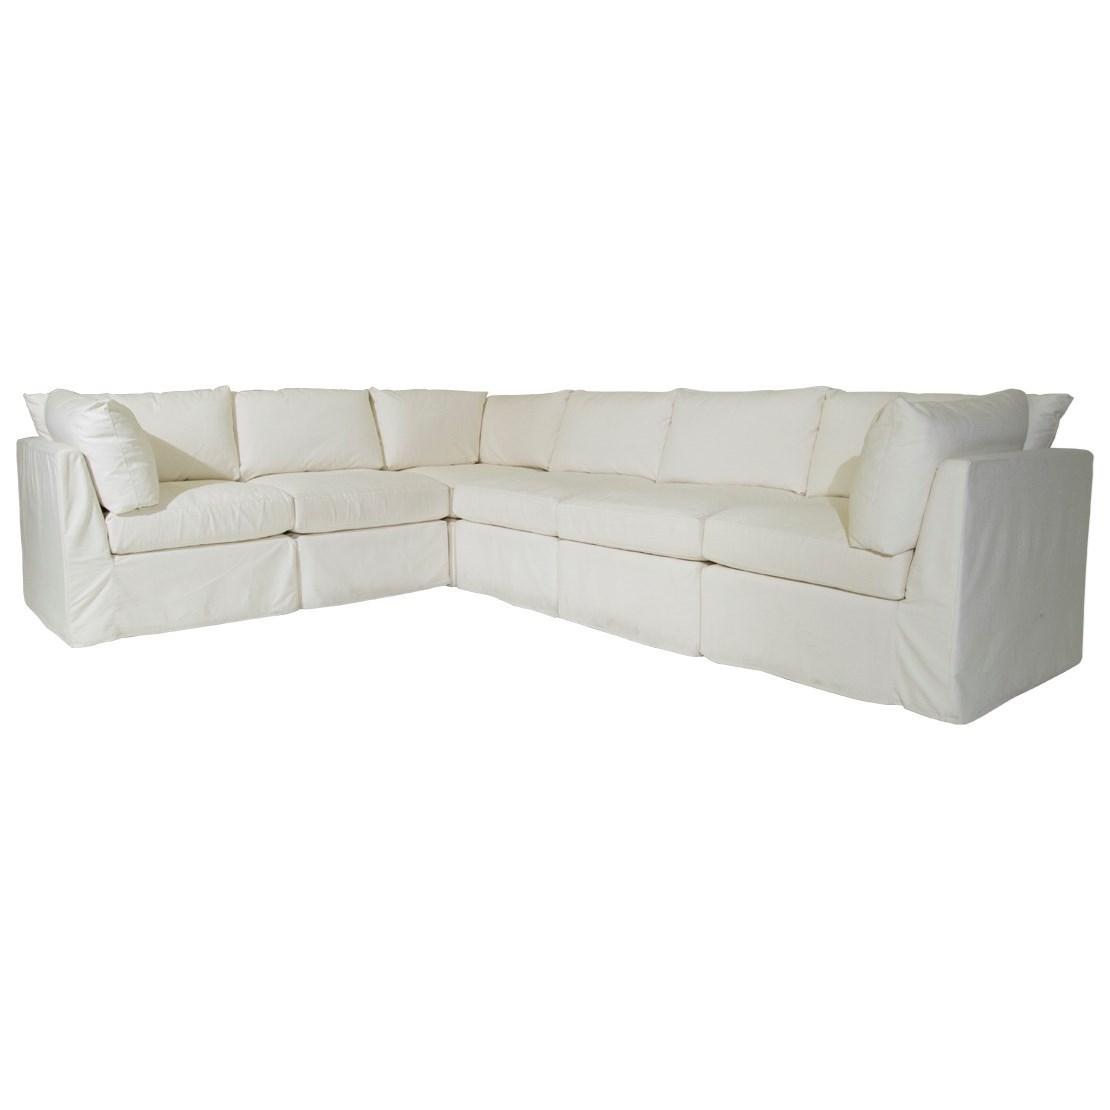 mccreary modern 1058 slipcover sectional c s wo sons hawaii rh hawaii cswoandsons com  mccreary modern sofa reviews